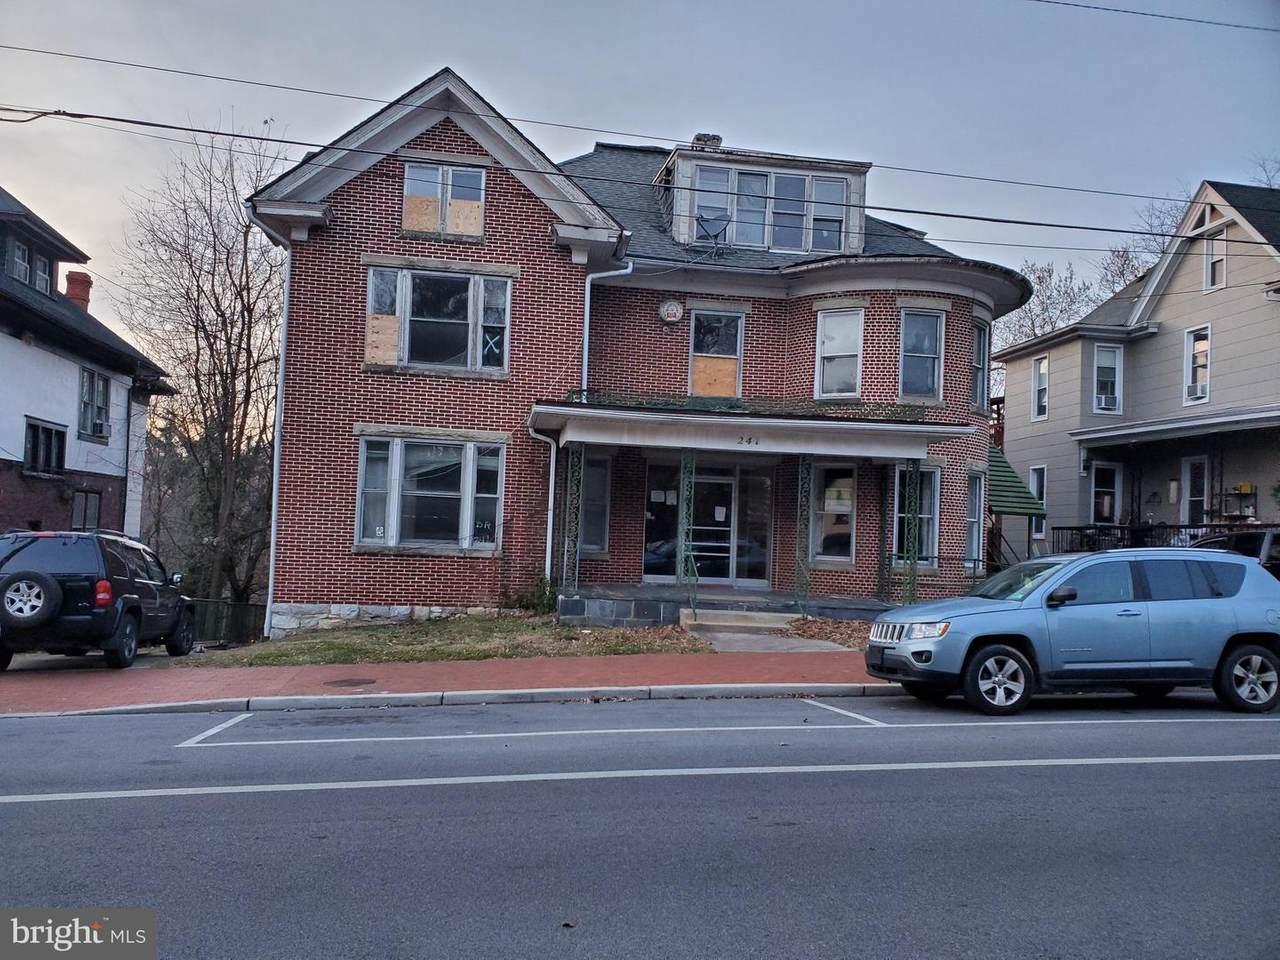 241 Prospect Street - Photo 1